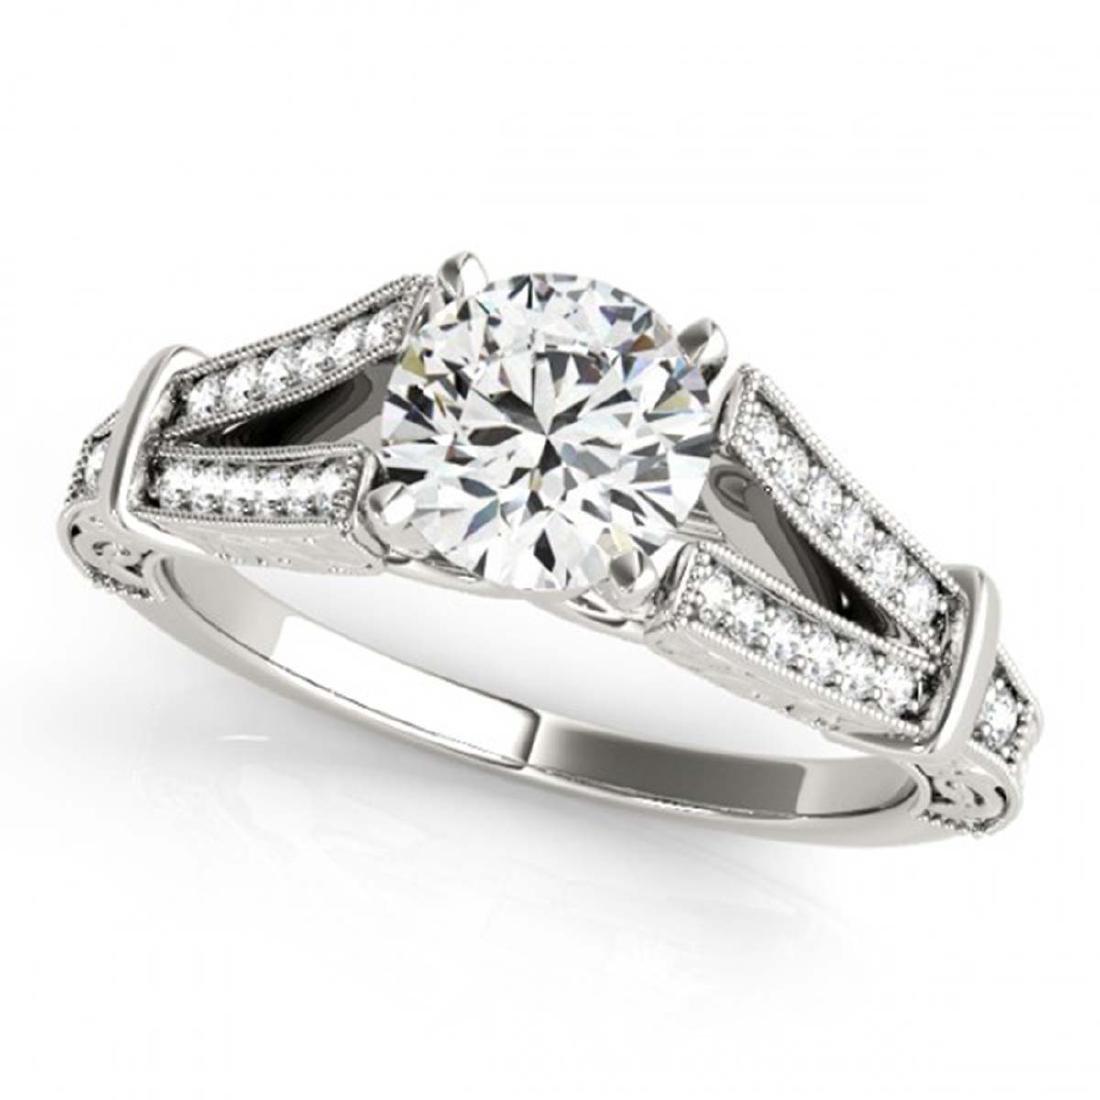 0.75 ctw VS/SI Diamond Ring 18K White Gold - REF-113M2F